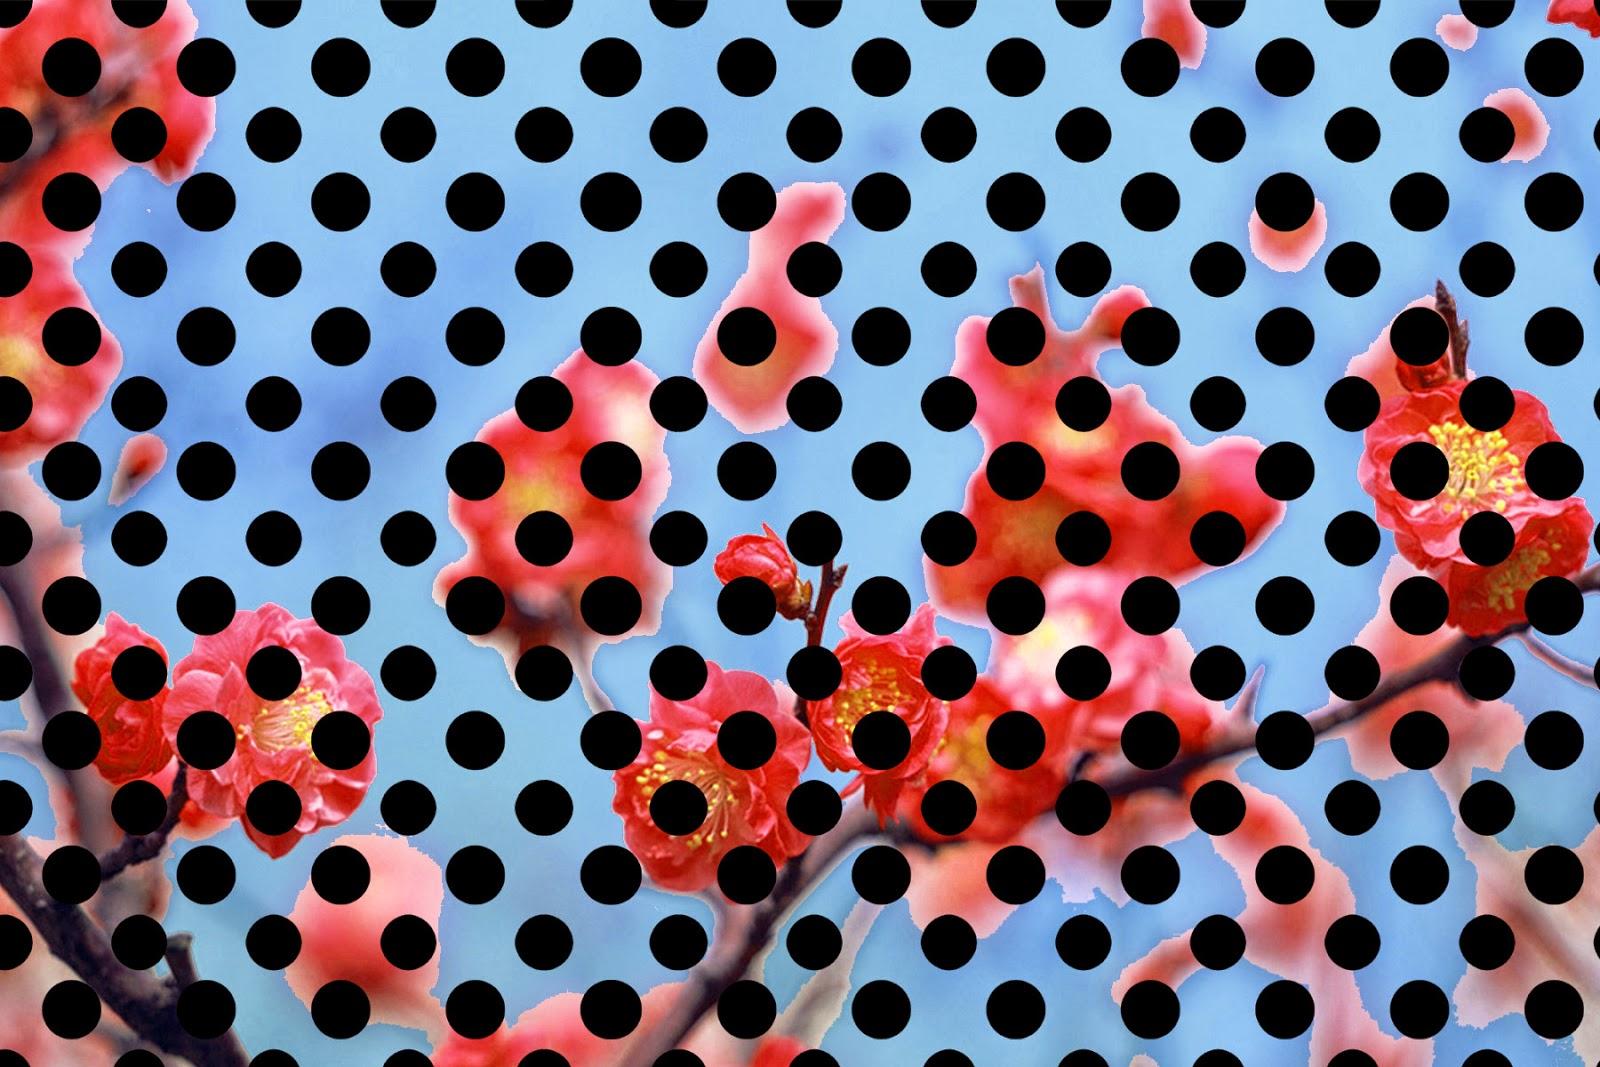 http://3.bp.blogspot.com/-sMfNJScoxVY/VJ32xtqbH5I/AAAAAAAA0fw/8Zt1znueXJY/s1600/polka%2Bdot%2Bflowers%2Bblue%2Bcoral.jpg